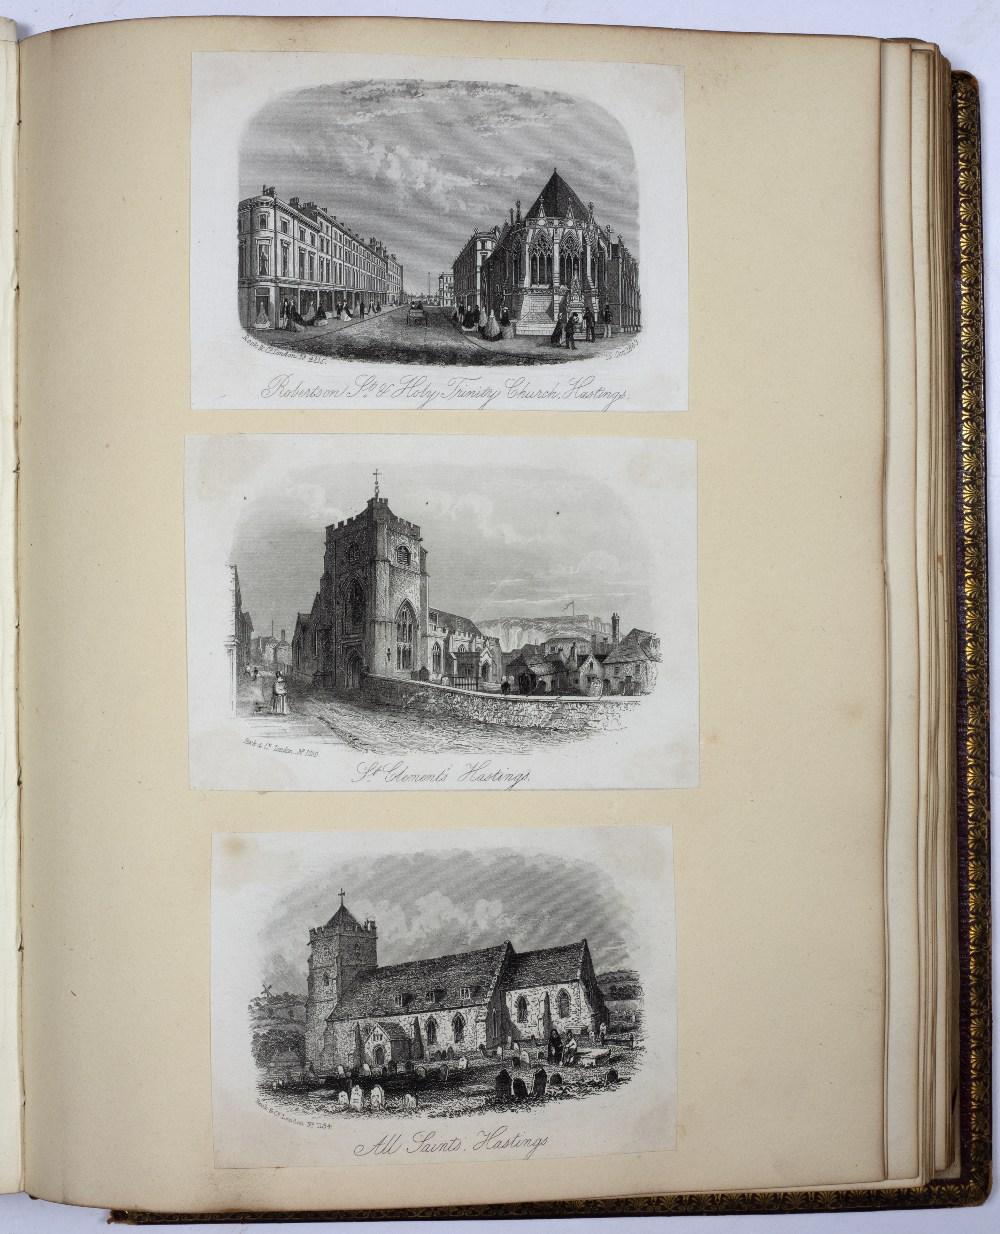 A VICTORIAN SCRAP ALBUM containing sketches, postcards, prints etc., Isle of Wight, London, etc.